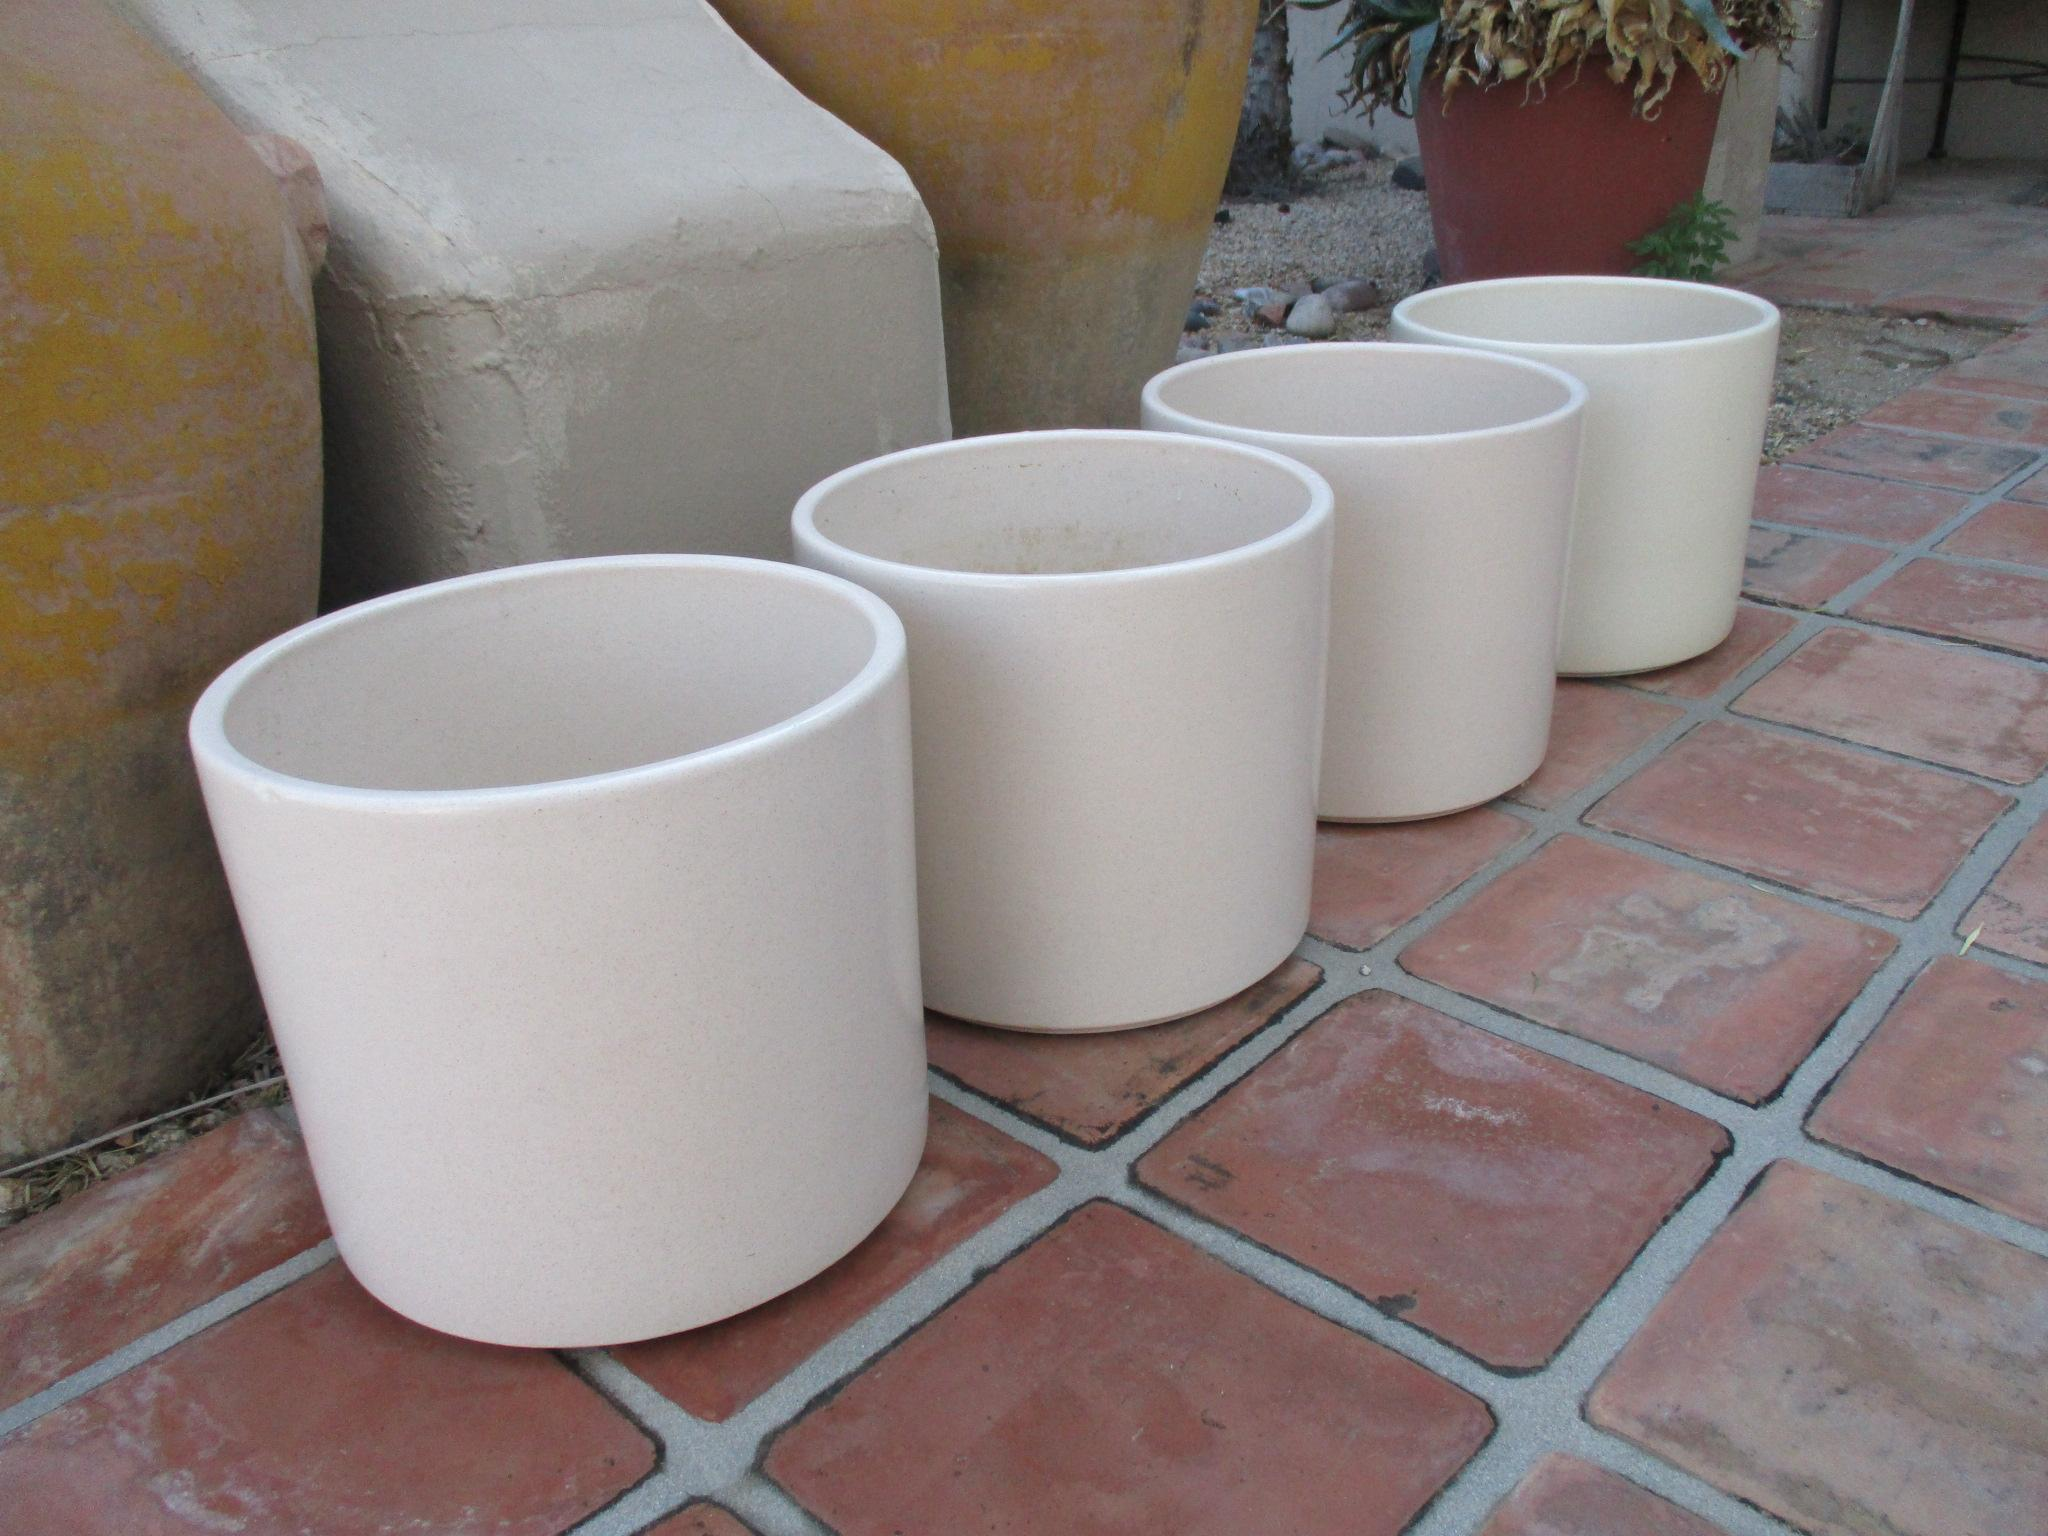 Ideal Gainey Mid Century Modern Planter Pots Pot - Set 4 | Chairish DF39